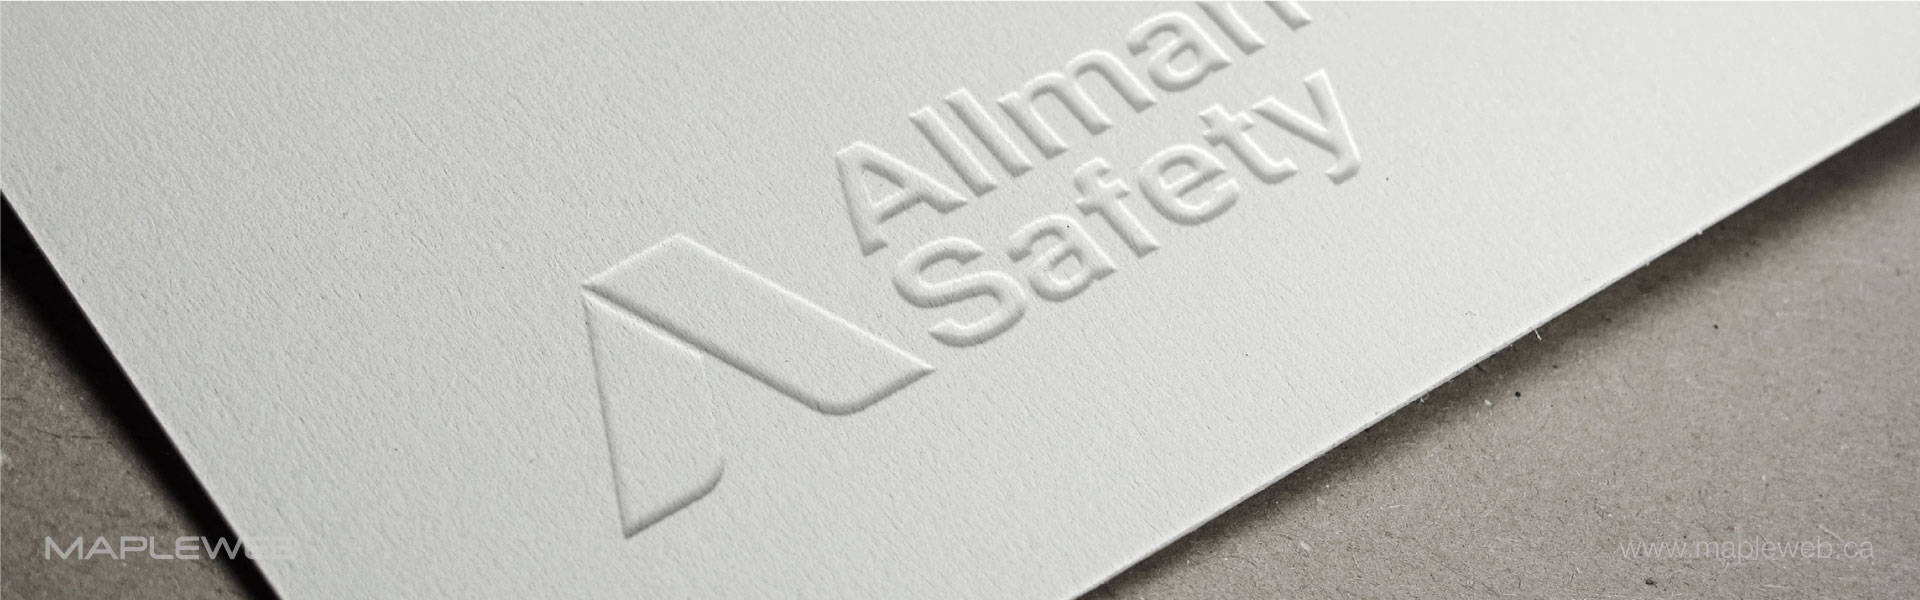 allman-safety-brand-logo-design-by-mapleweb-vancouver-canada-white-paper-black-logo-mock